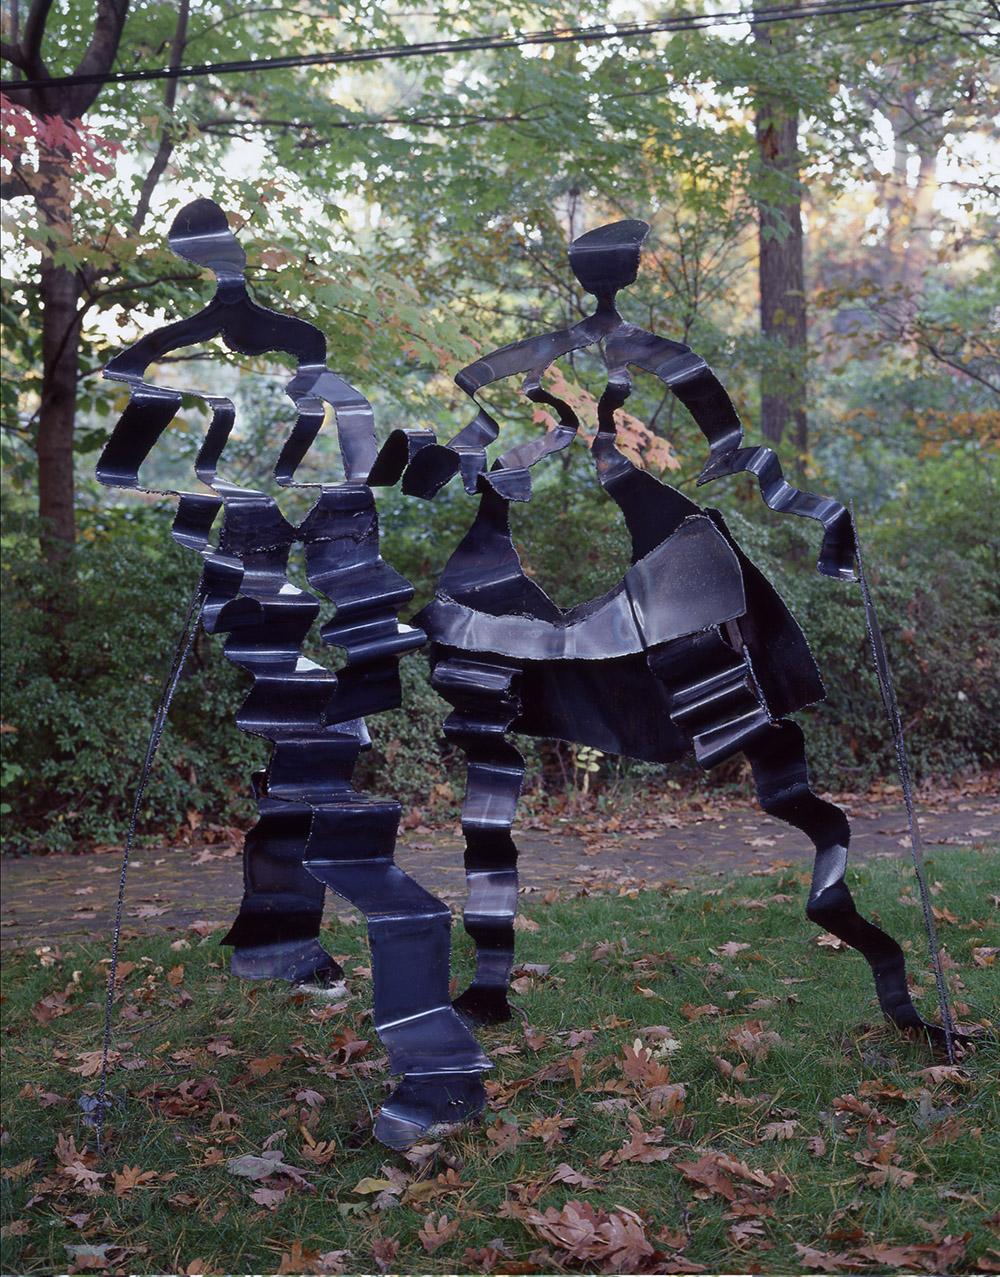 13.a-Ono-Dancing-1999.-Steel-213.4-x-182.9-x-76.2-cm-x.jpg